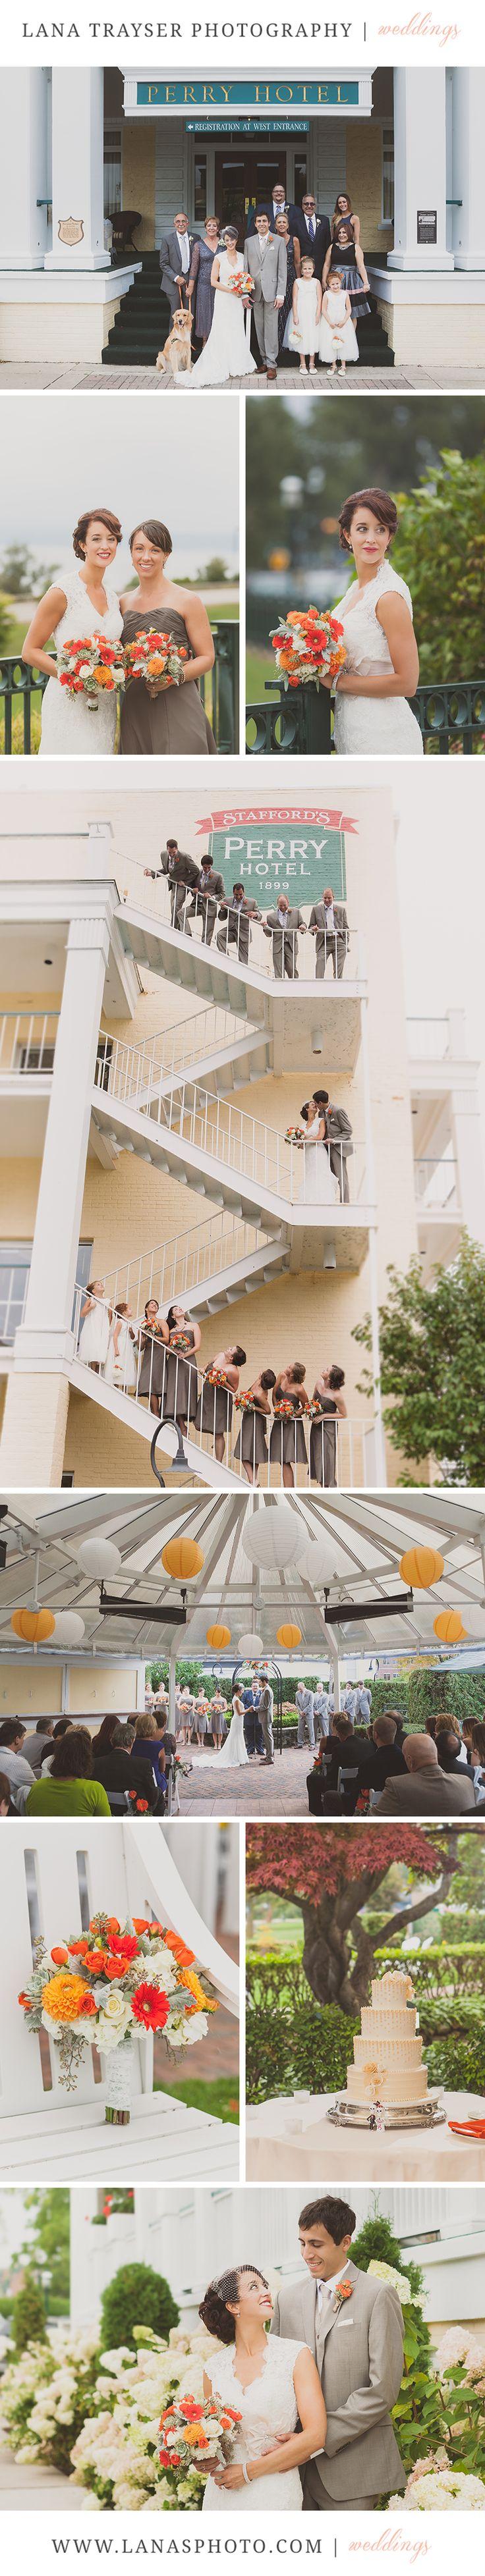 Bridal Party   Petoskey wedding  Perry Hotel   Lana Trayser Photography   Michigan wedding photography